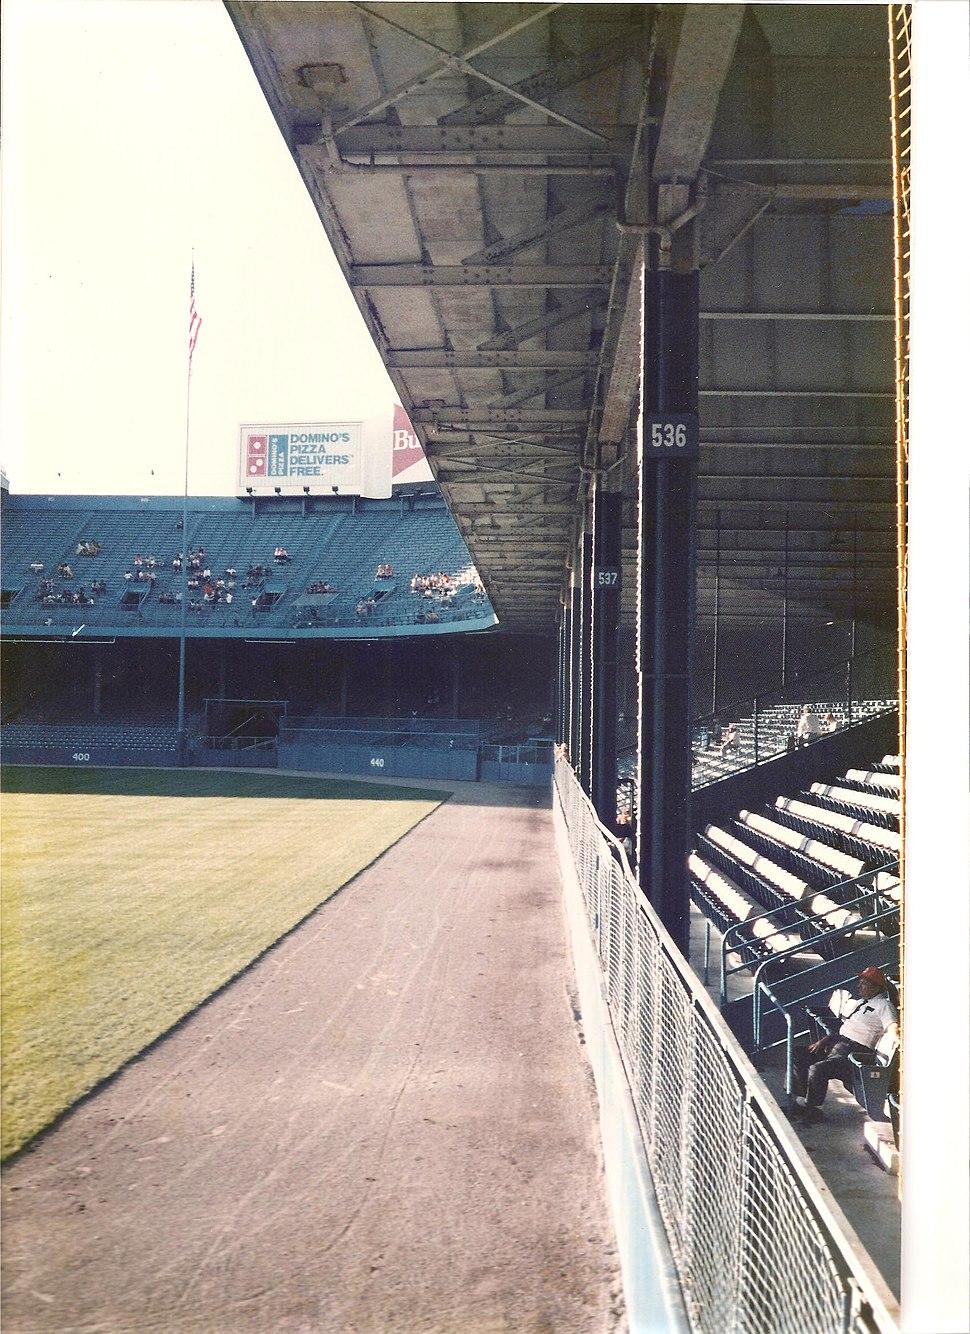 Tiger-Stadium-Overhang